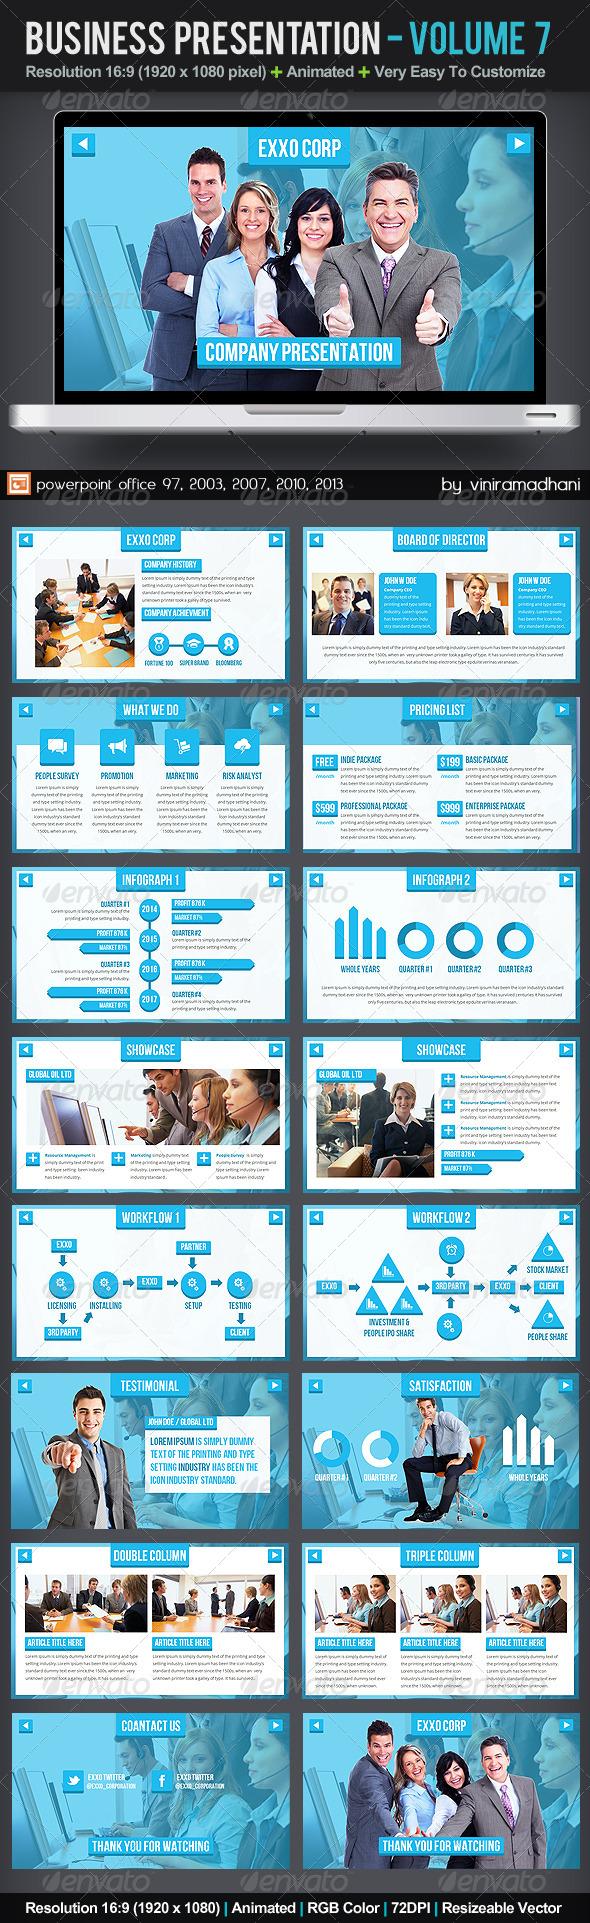 GraphicRiver Business Presentation Volume 7 6101717